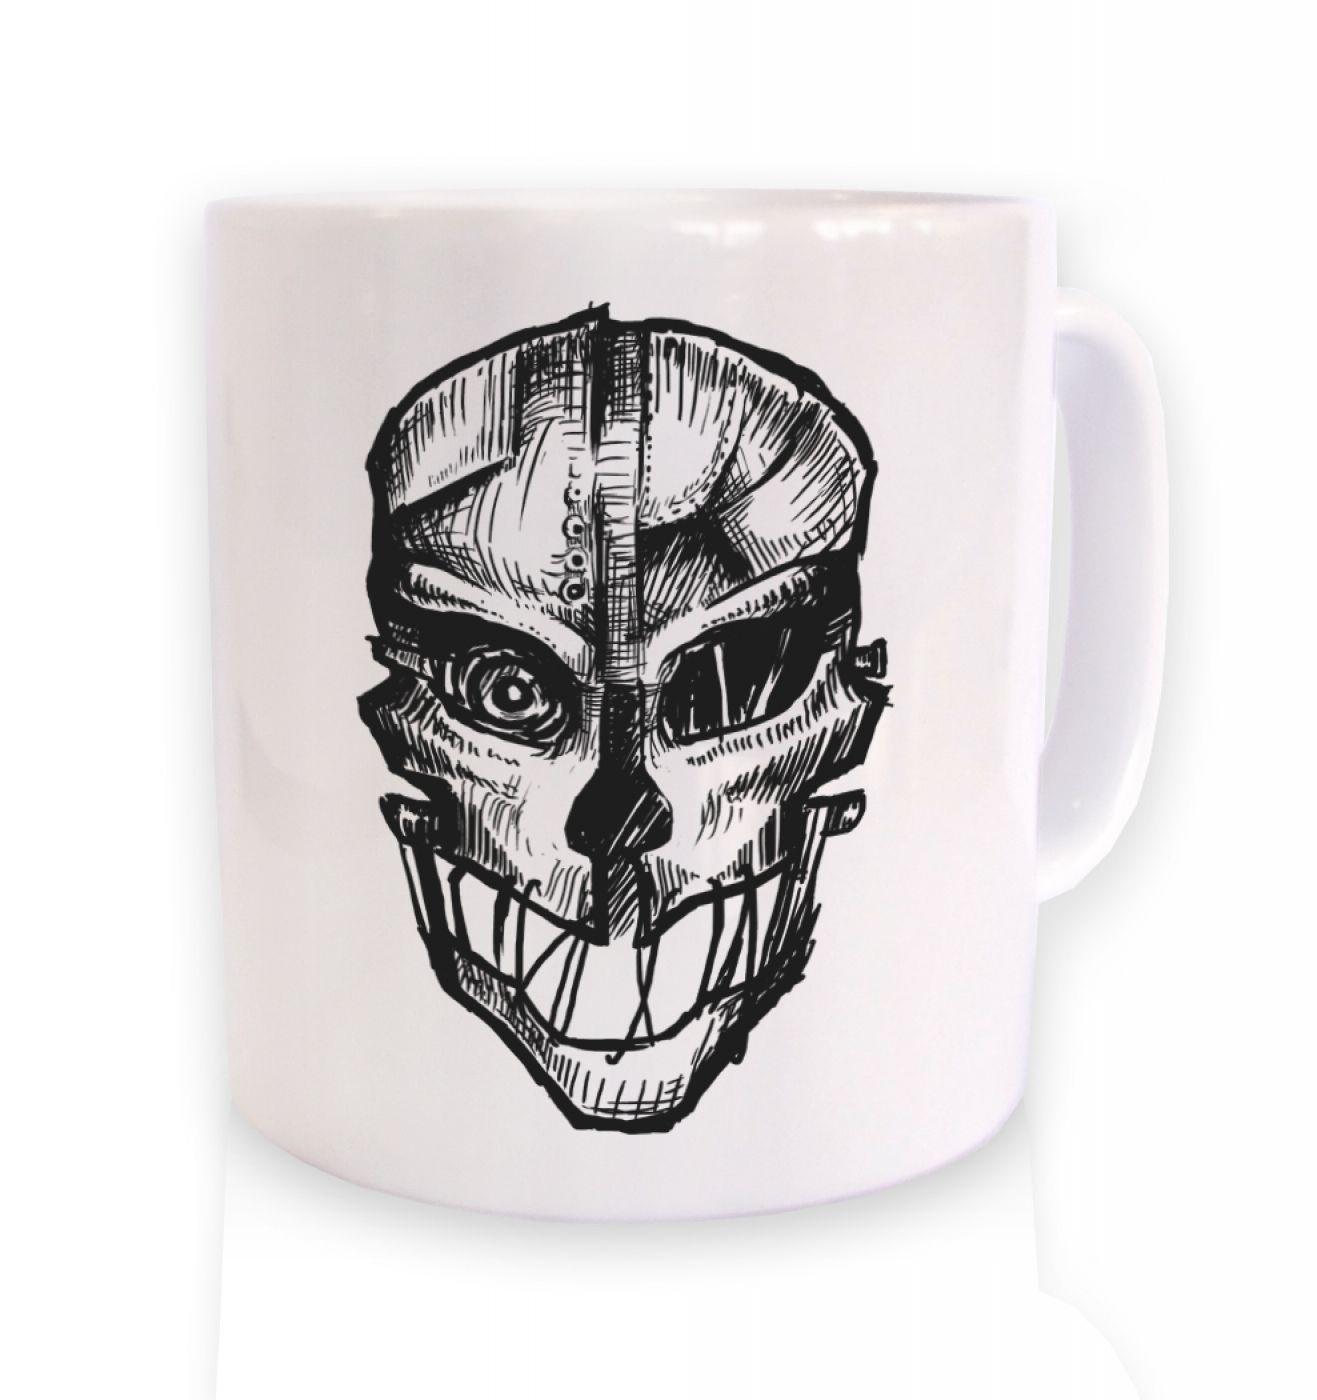 Assassin's Mask ceramic coffee mug